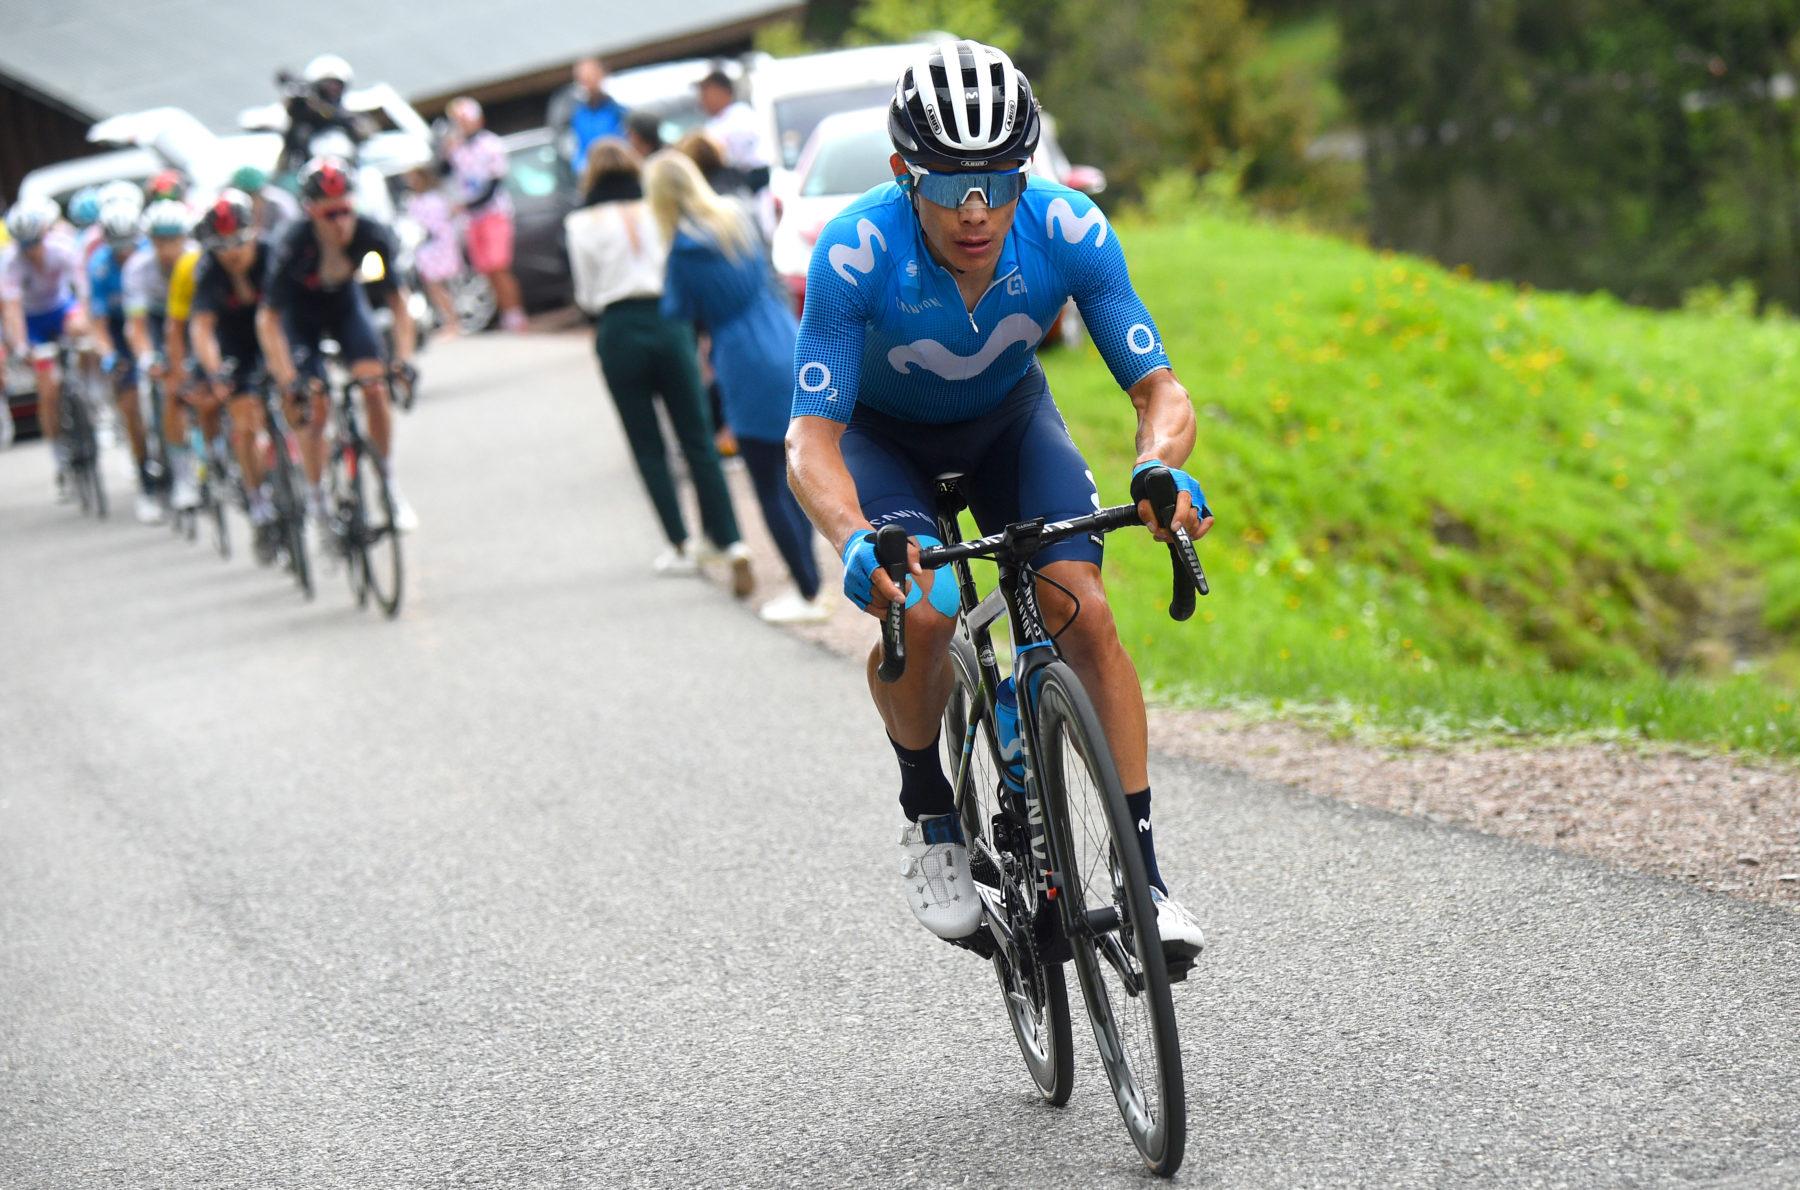 Imagen de la noticia 'López combative until very end, takes 6th overall in Dauphiné'